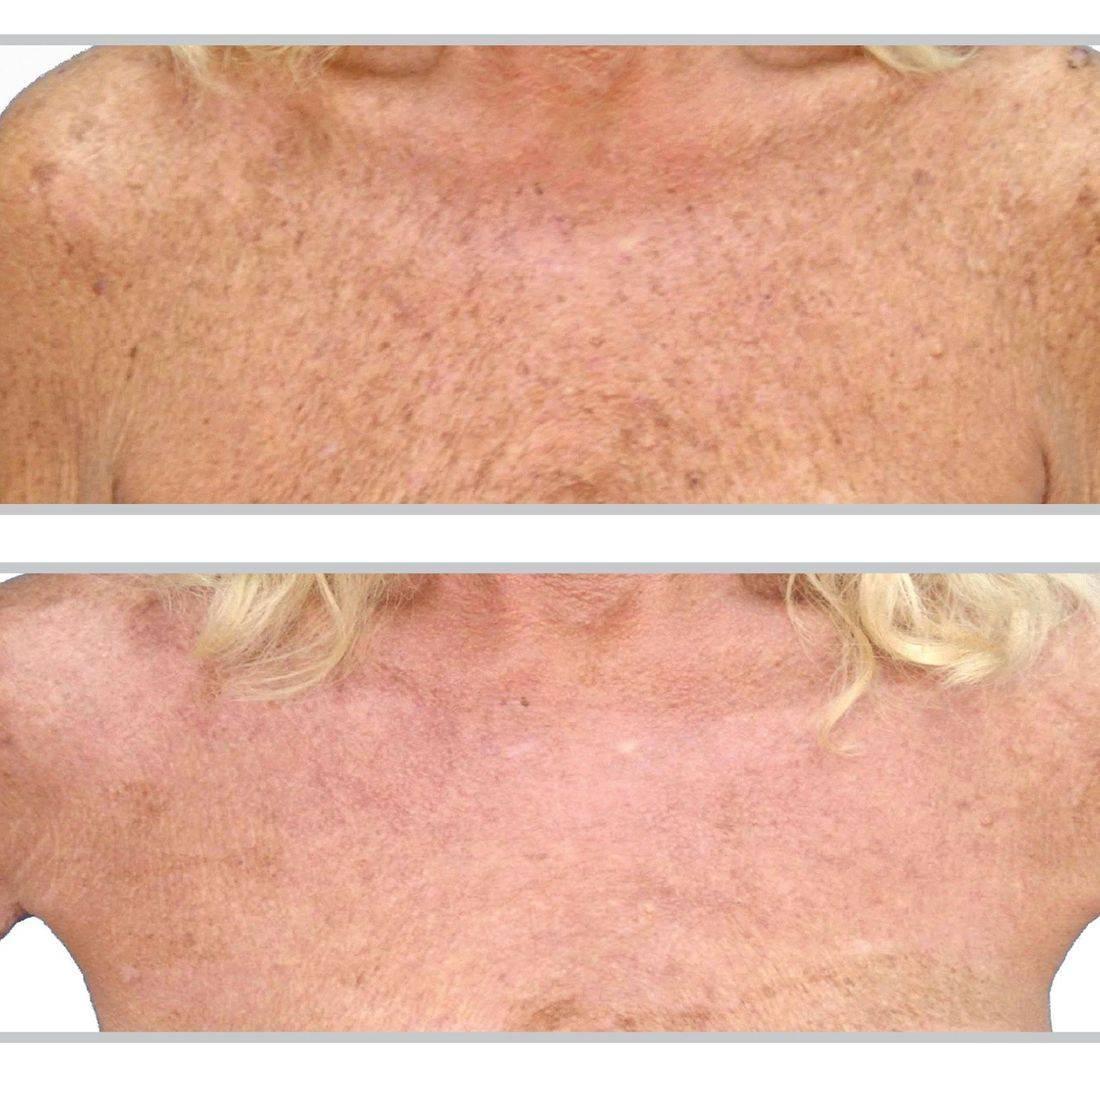 BBL Treatment Sciton Laser Age Spots Sun Damage